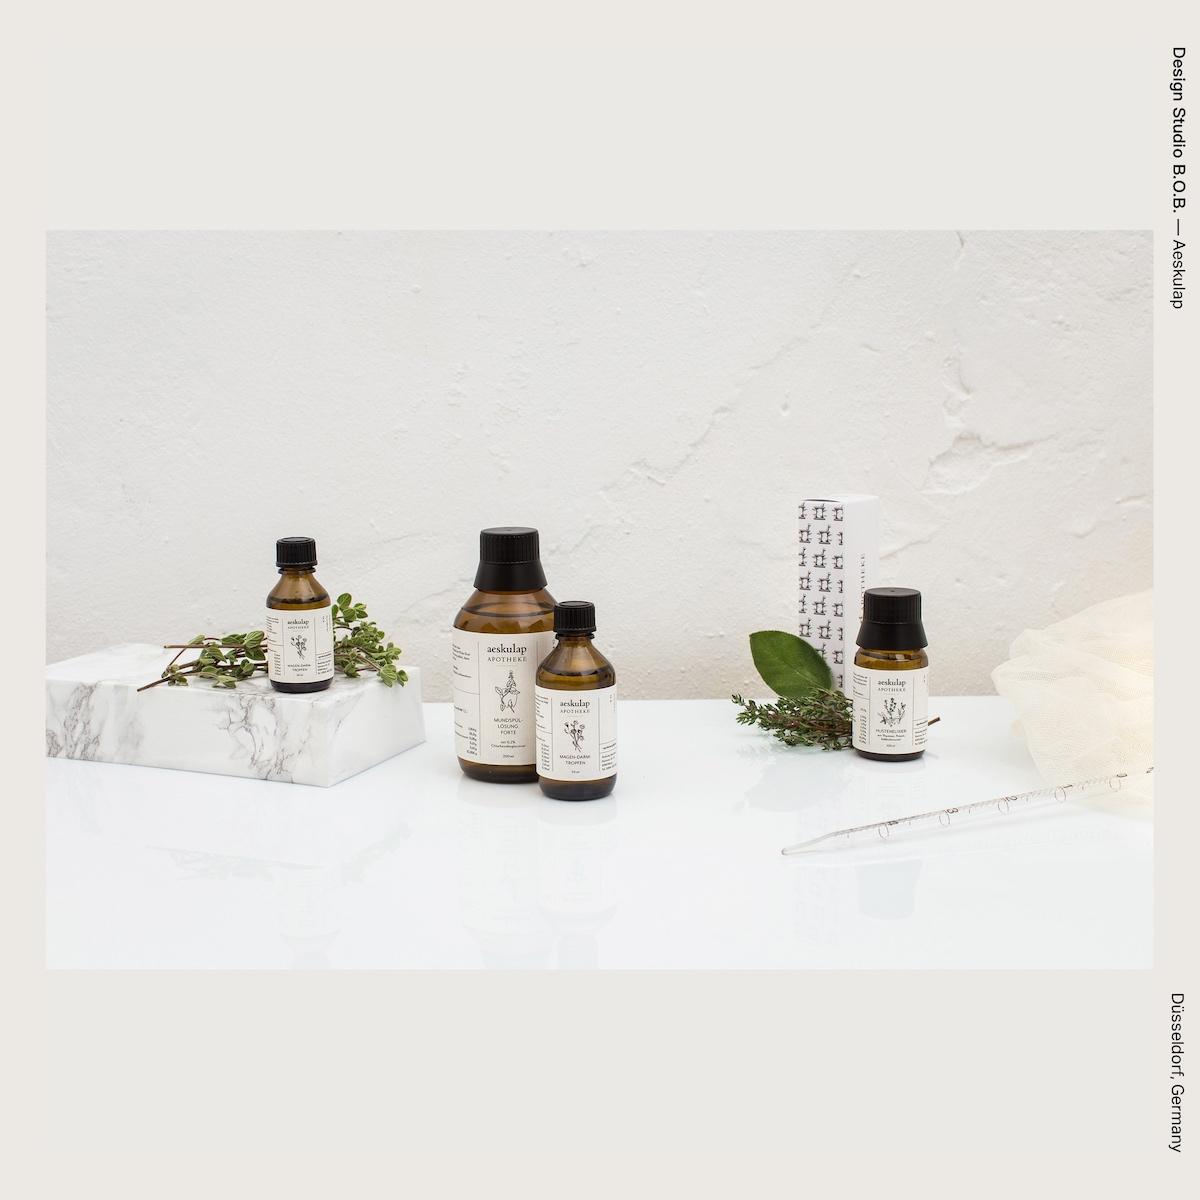 Design Studio B.O.B. — Aeskulap